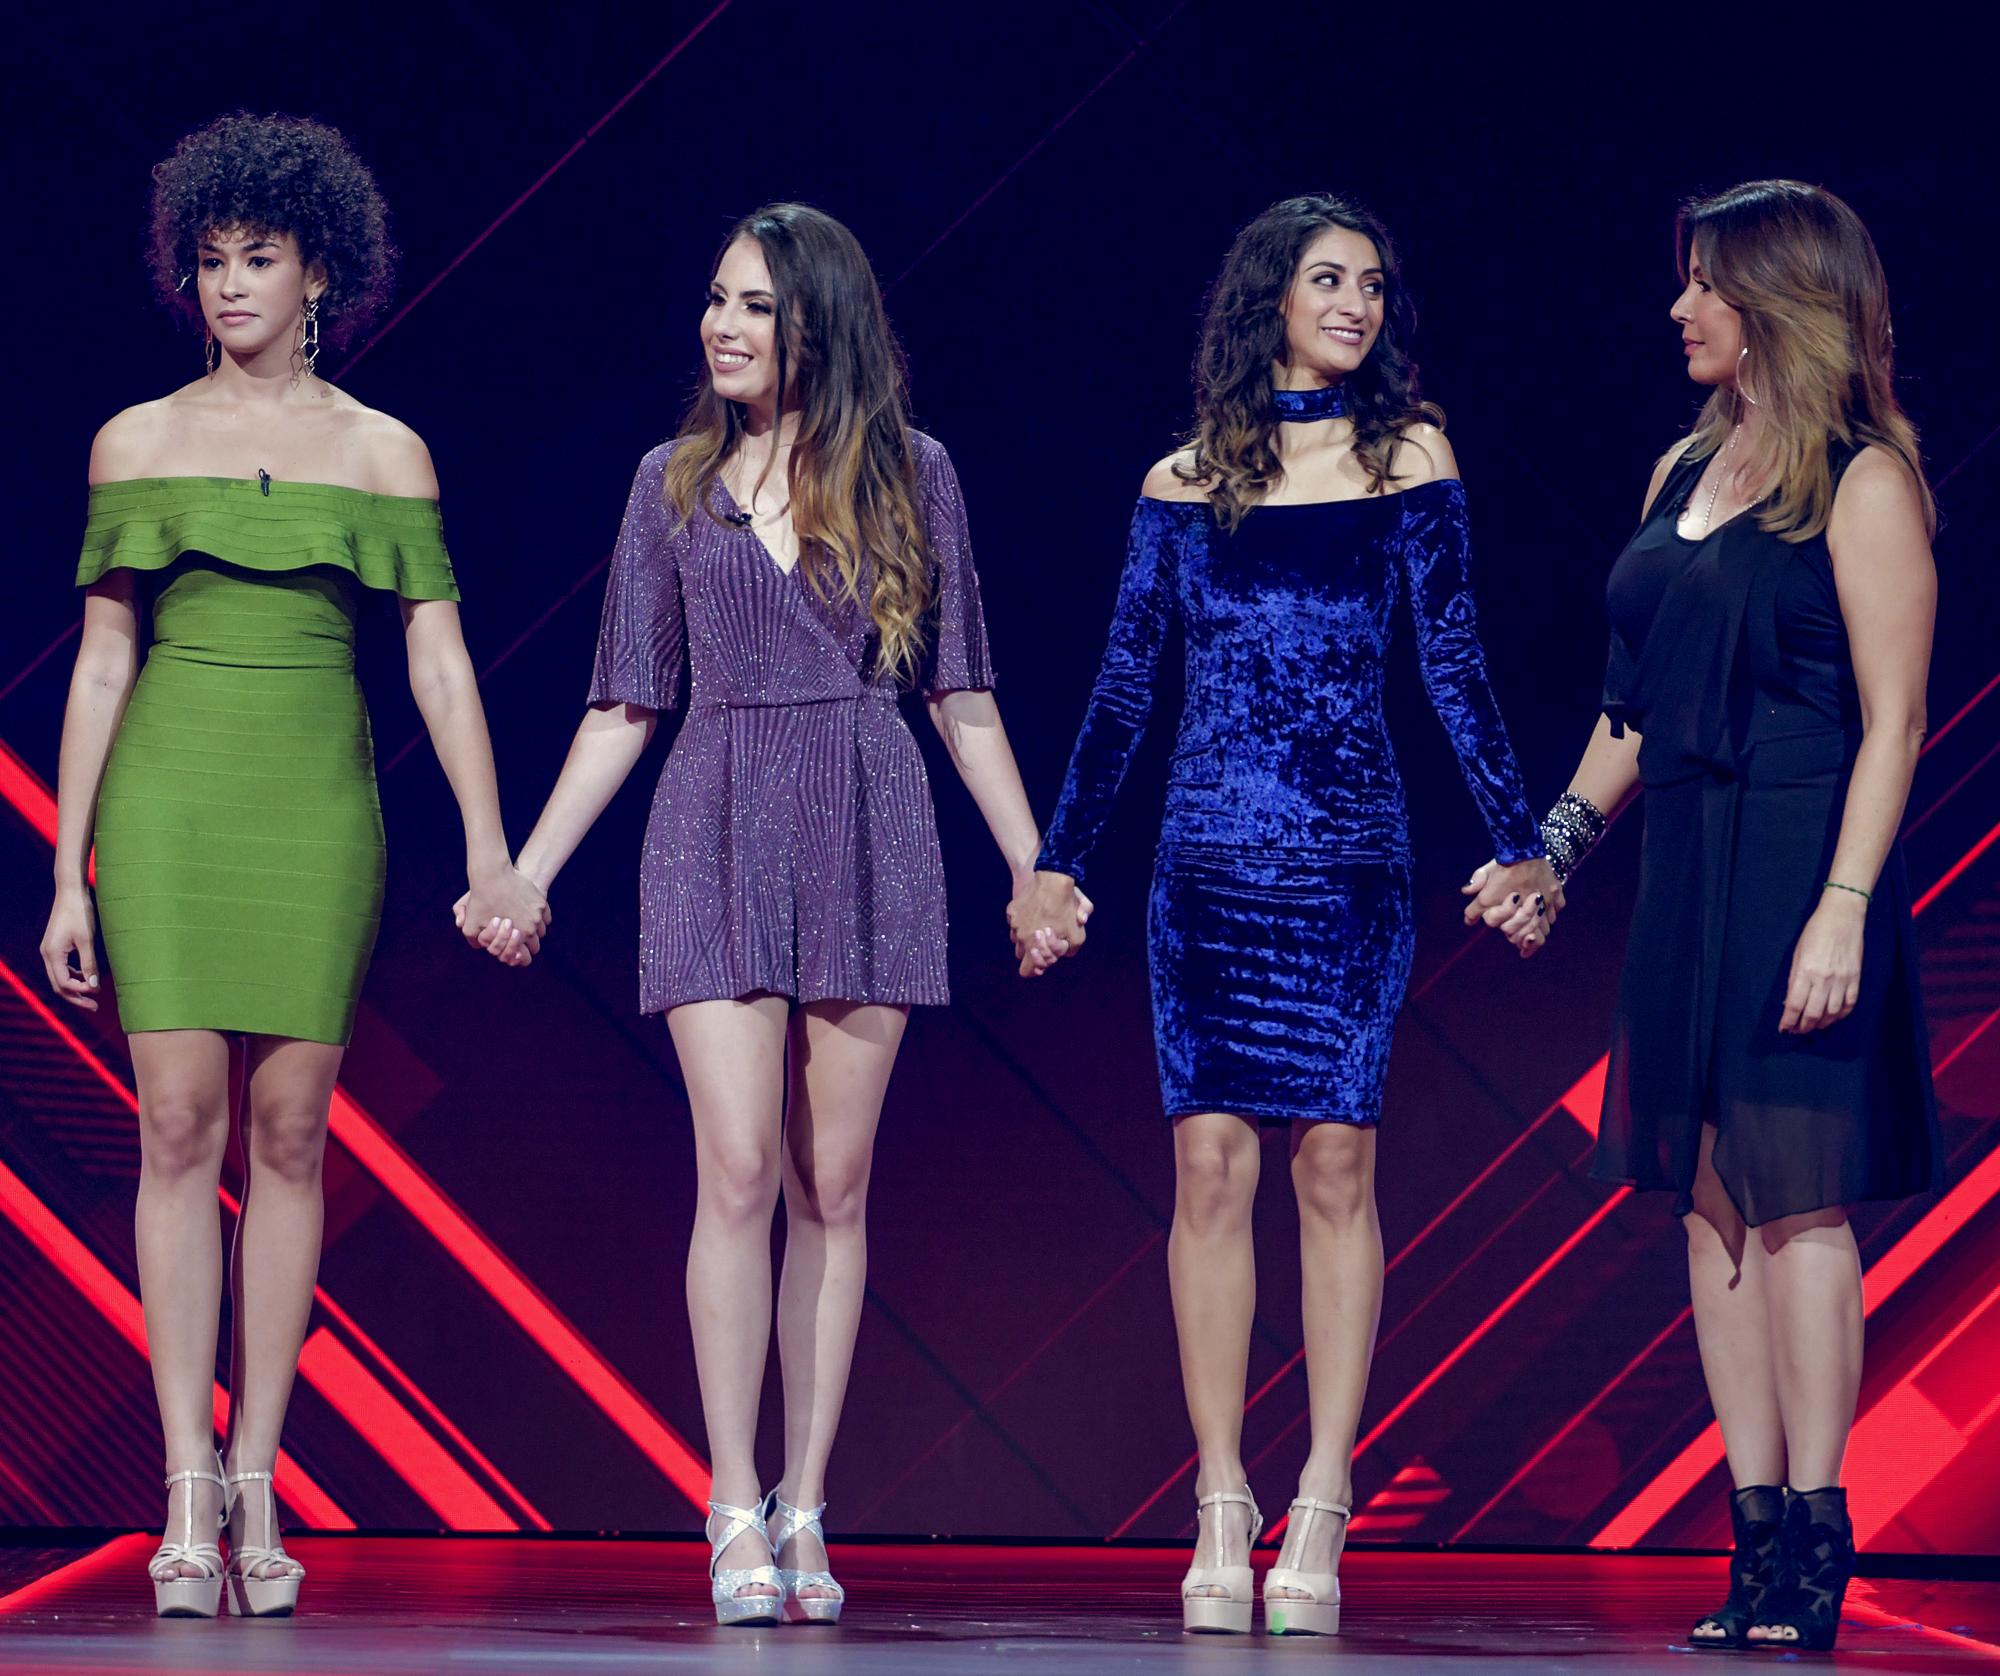 Desire Ortiz, Masiel Mantilla, Elvira Reyes y Carmen Batiz